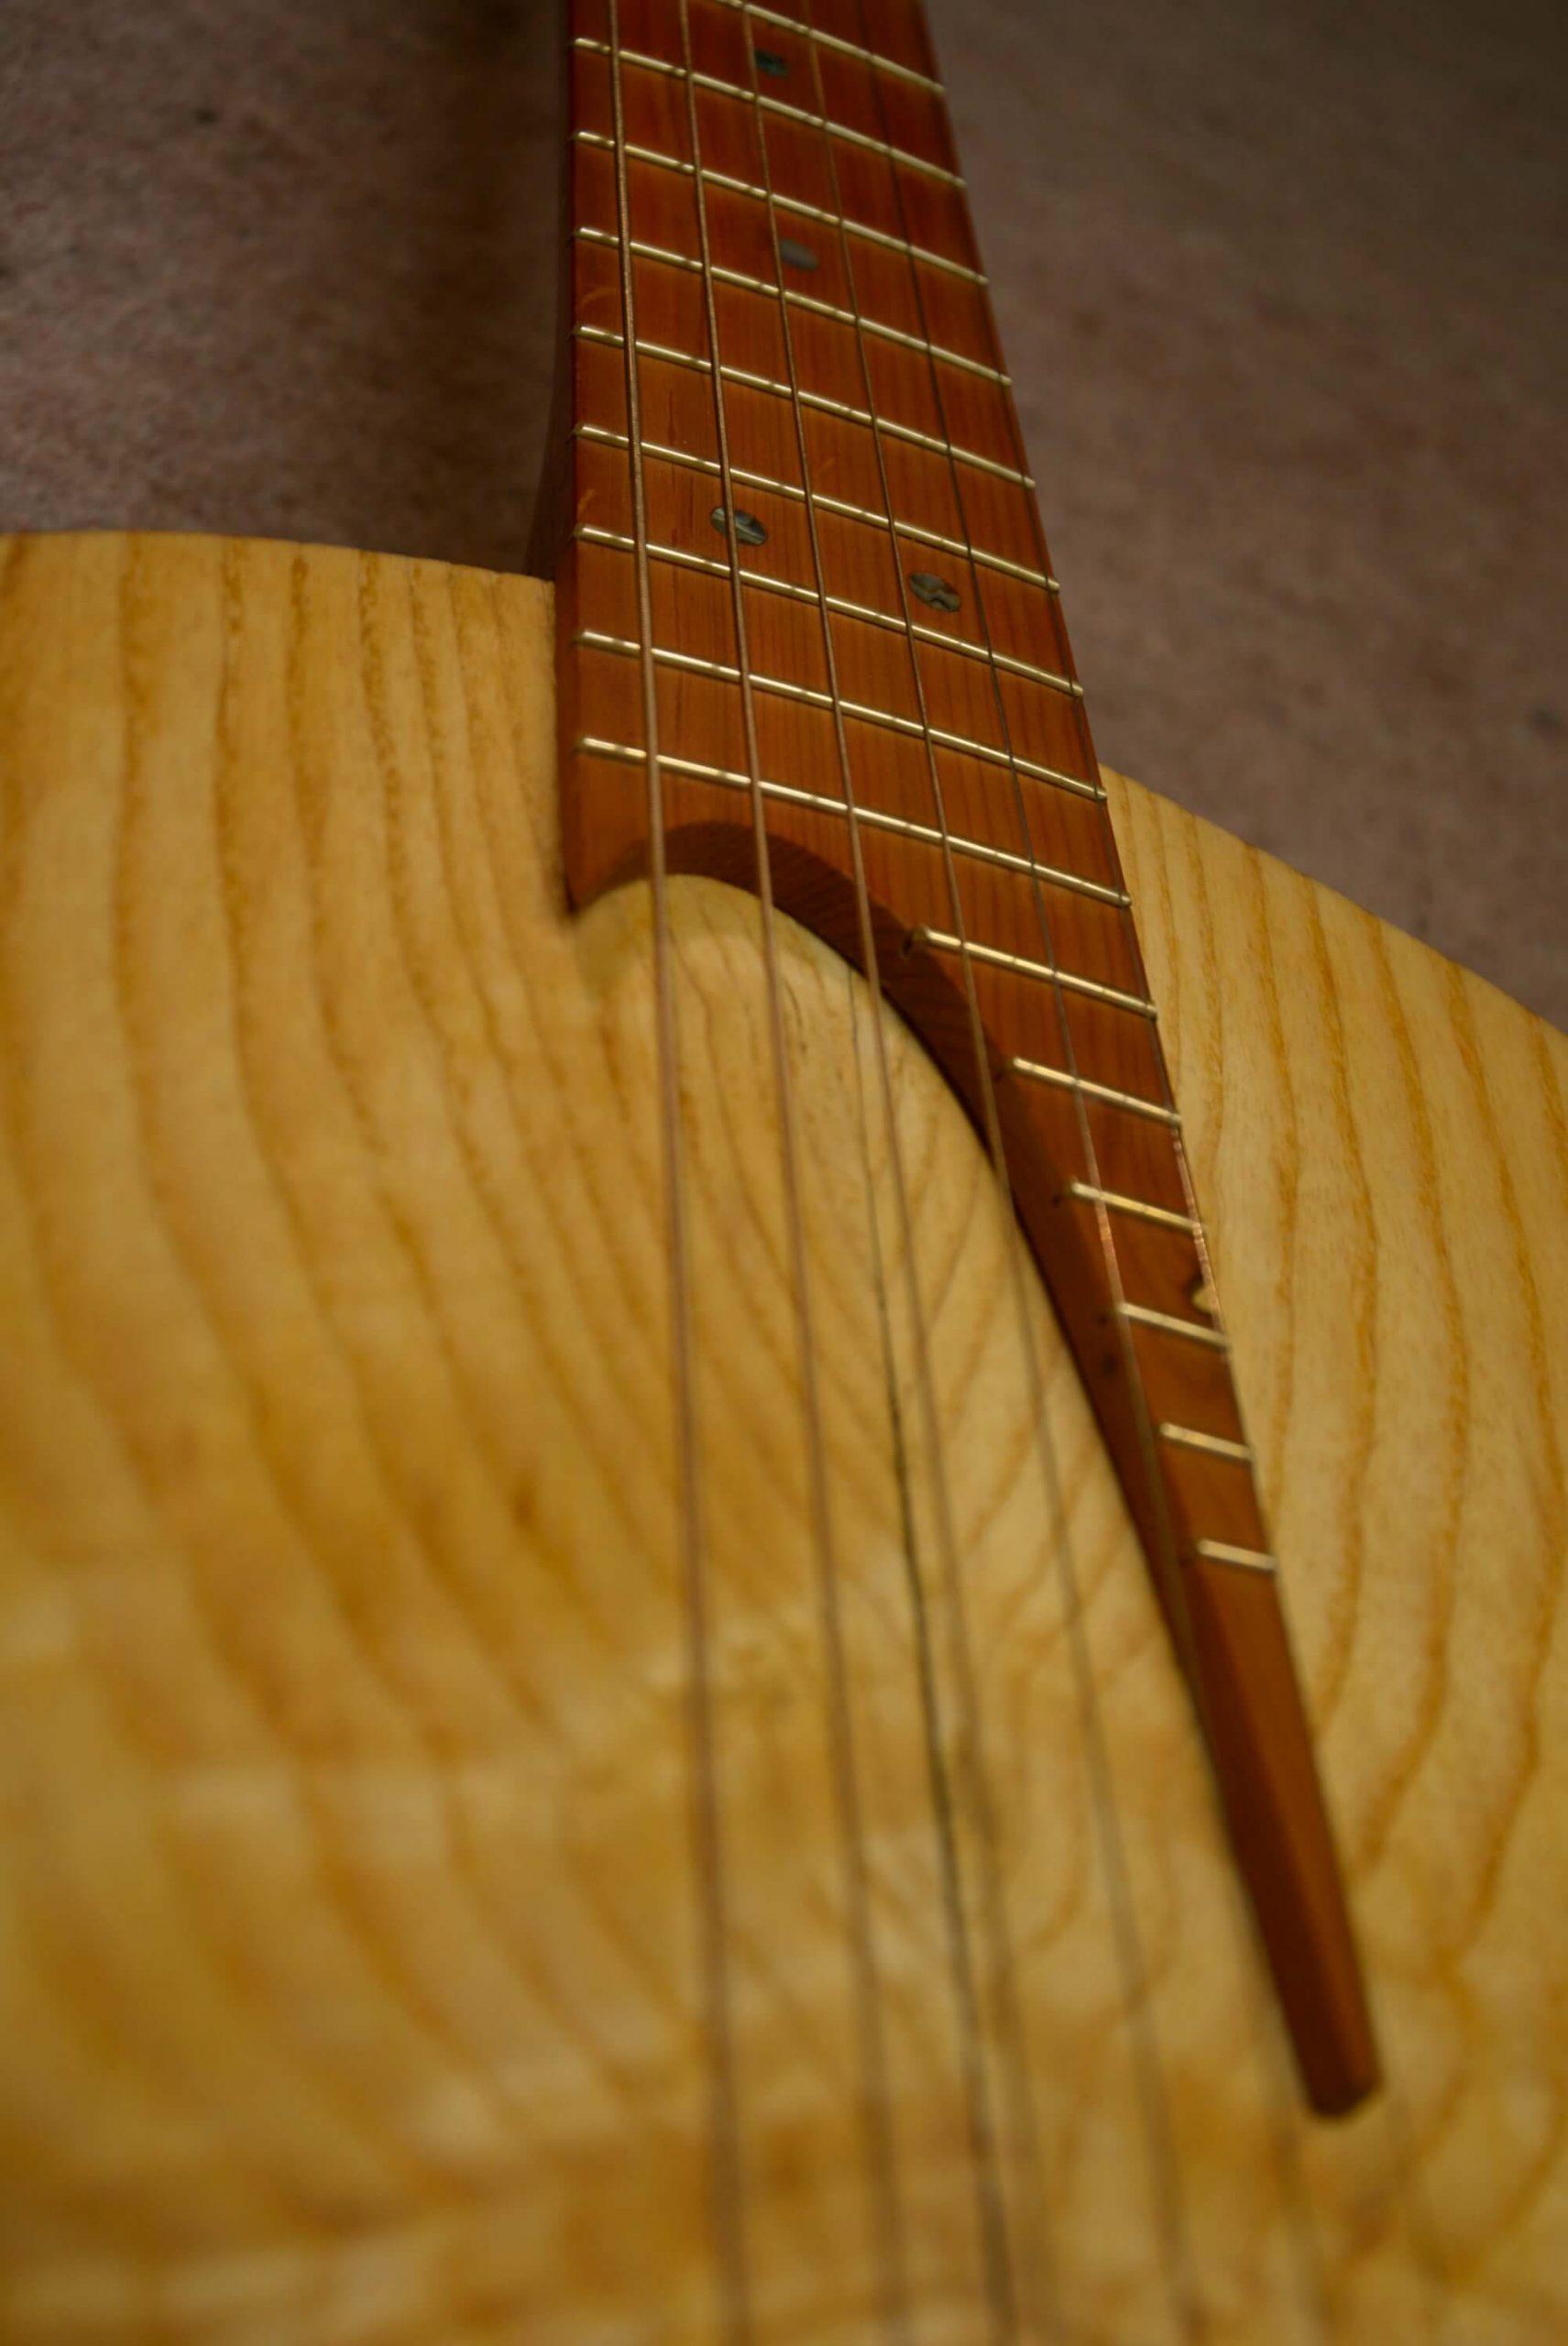 Cork Guitars - handmade instrument